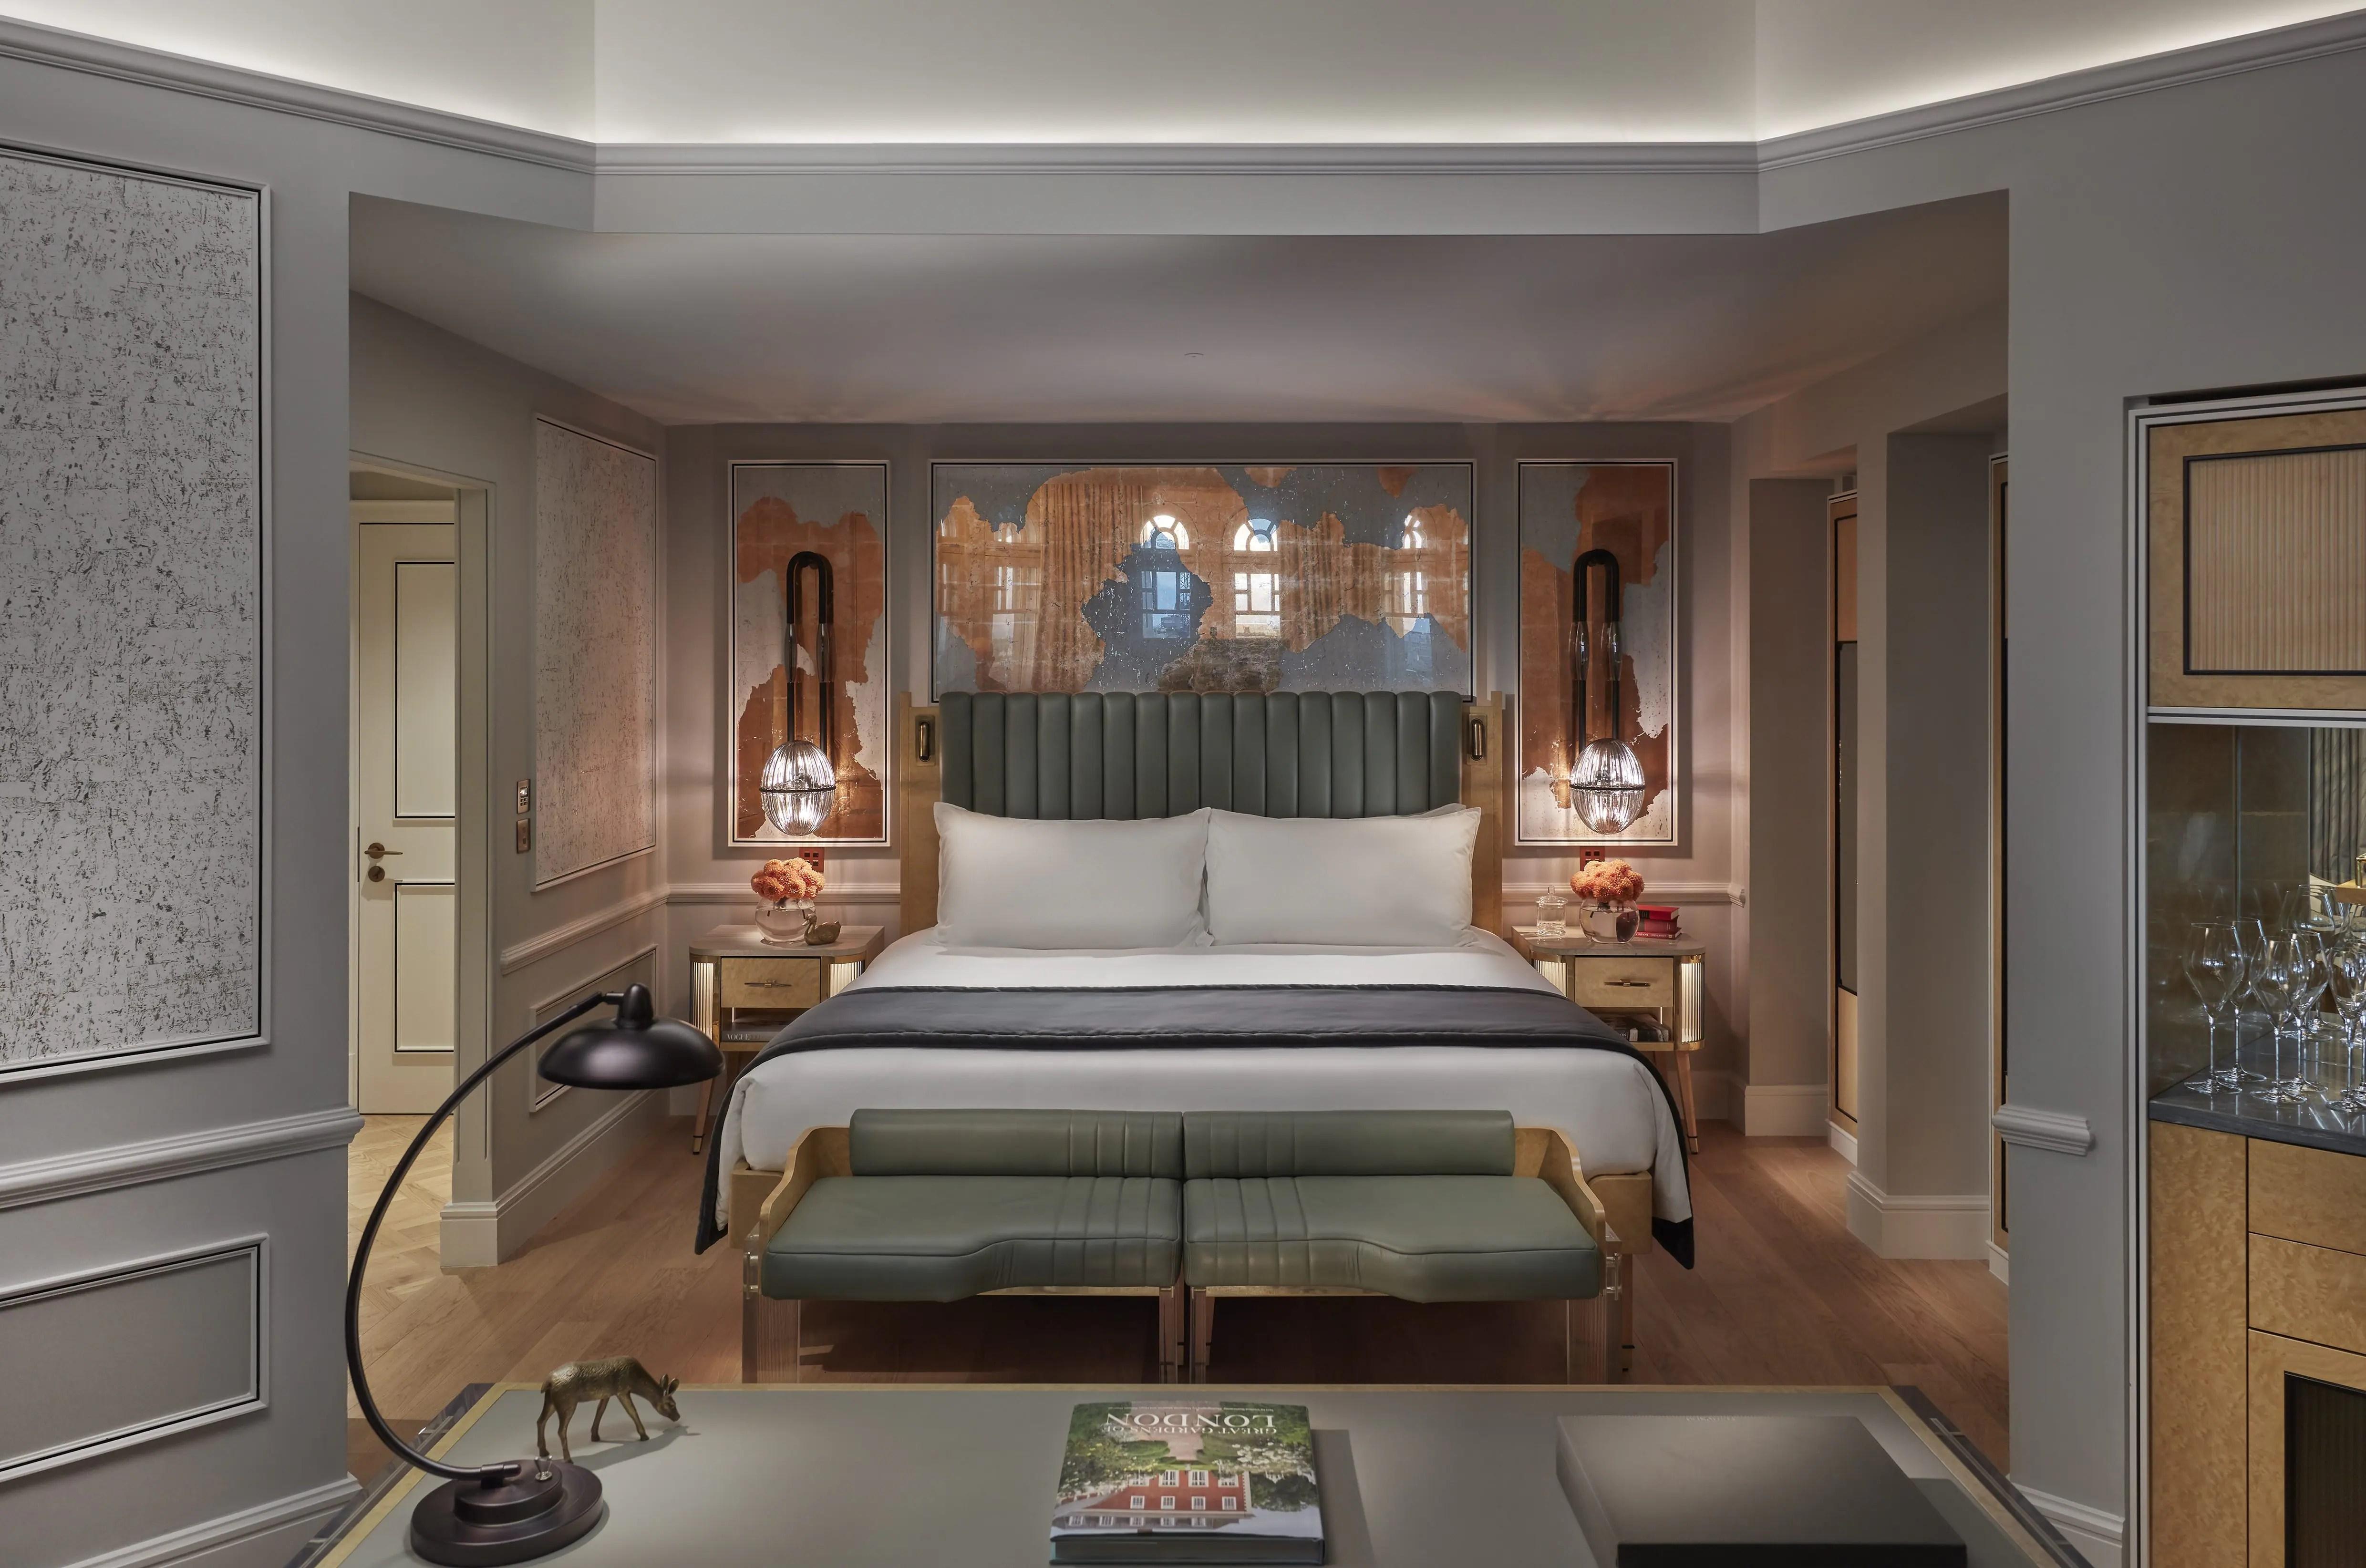 Luxury Hotels London  Renovation News  Mandarin Oriental